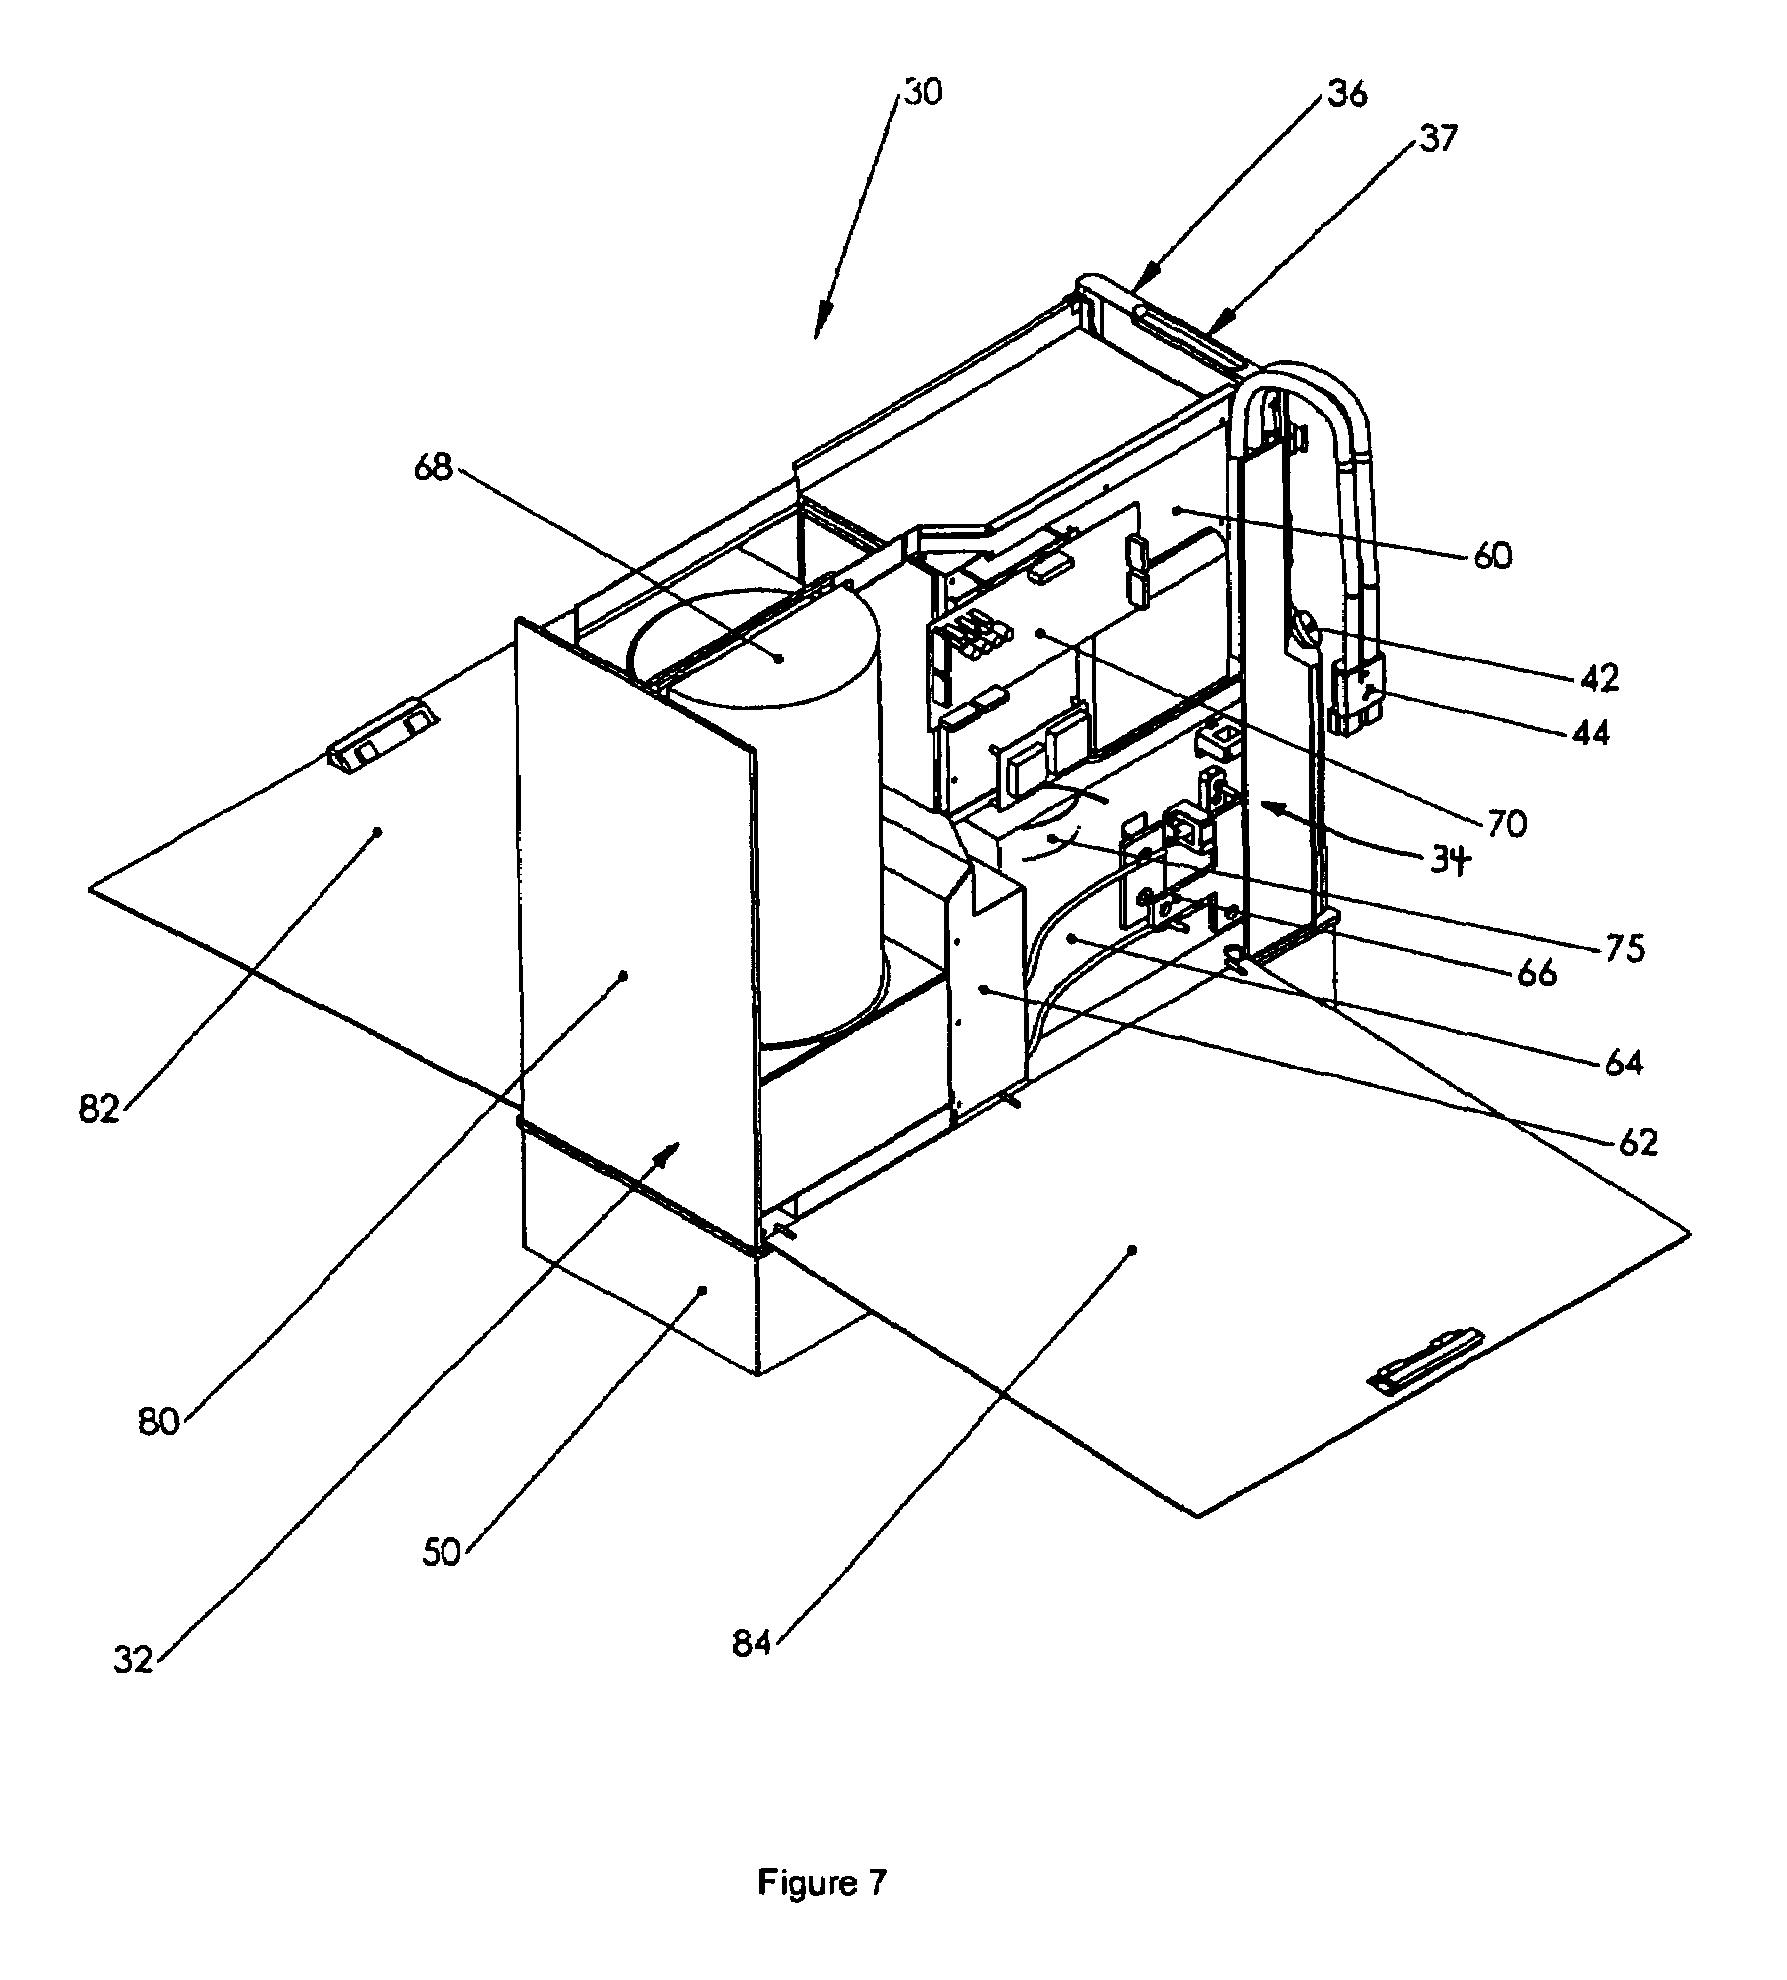 2001 Chevy Blazer Alarm Wiring Diagram Wiring Solutions